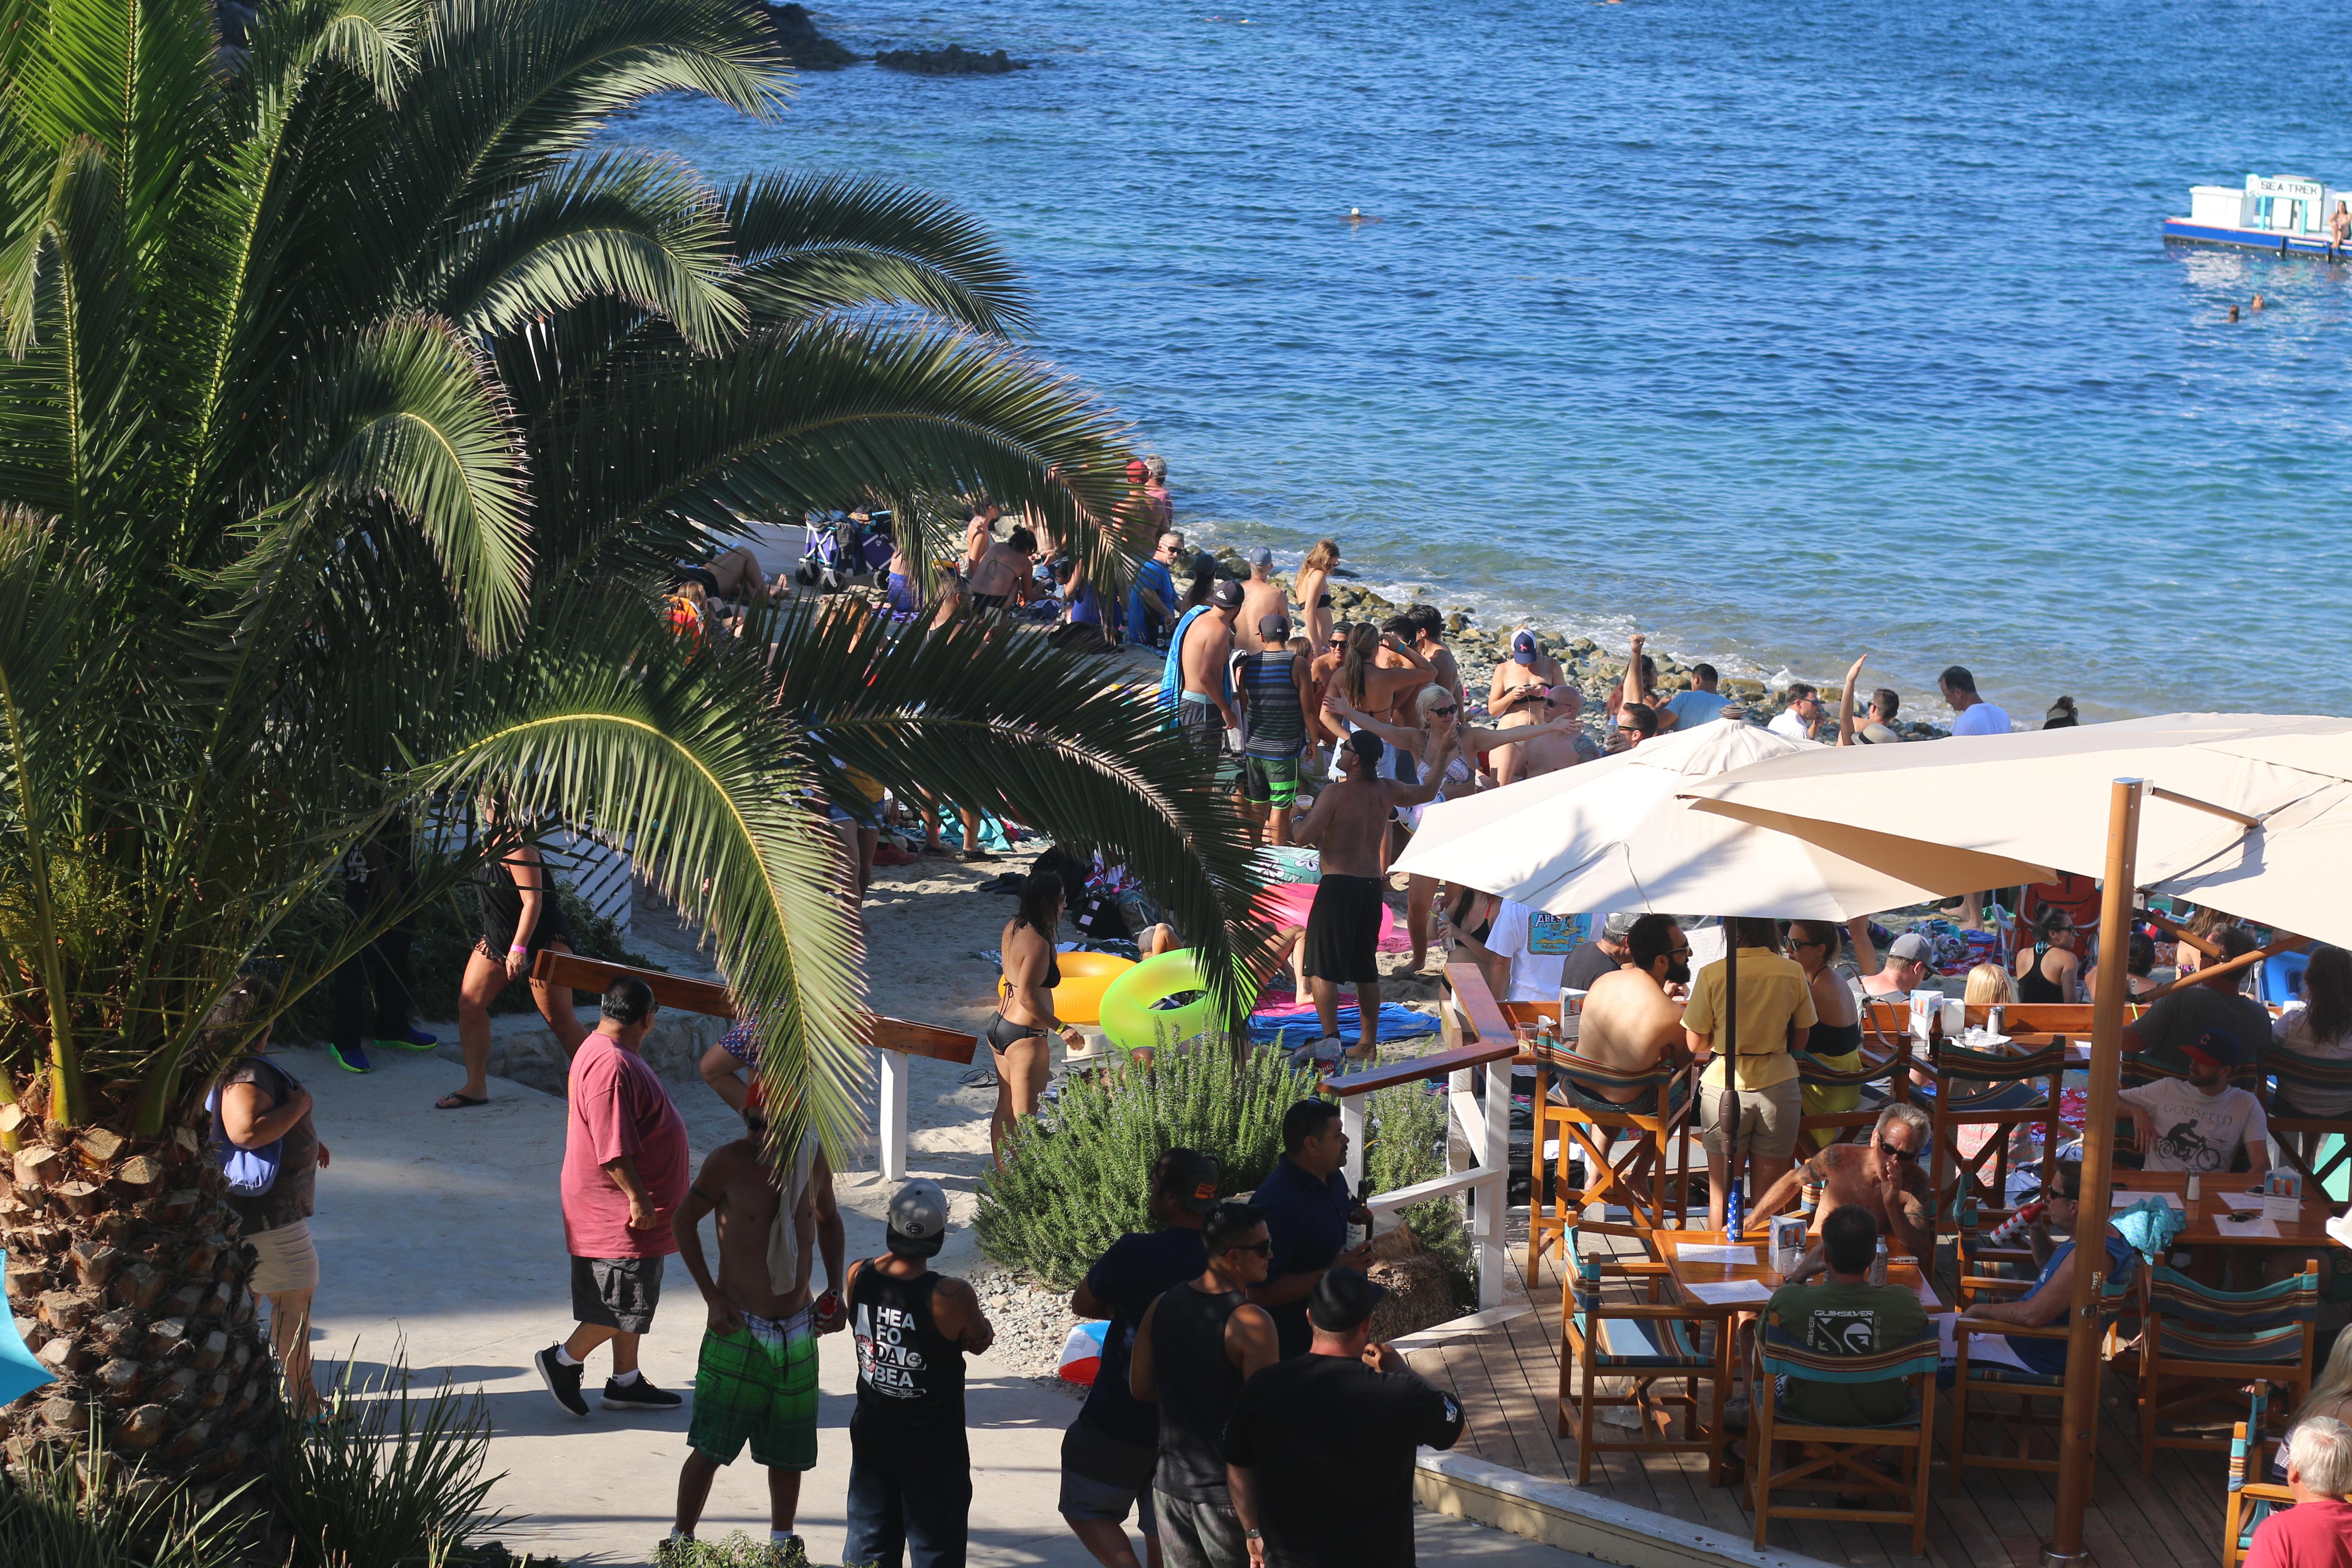 Descanso Beach Club Summer Beach Parties | Visit Catalina Island